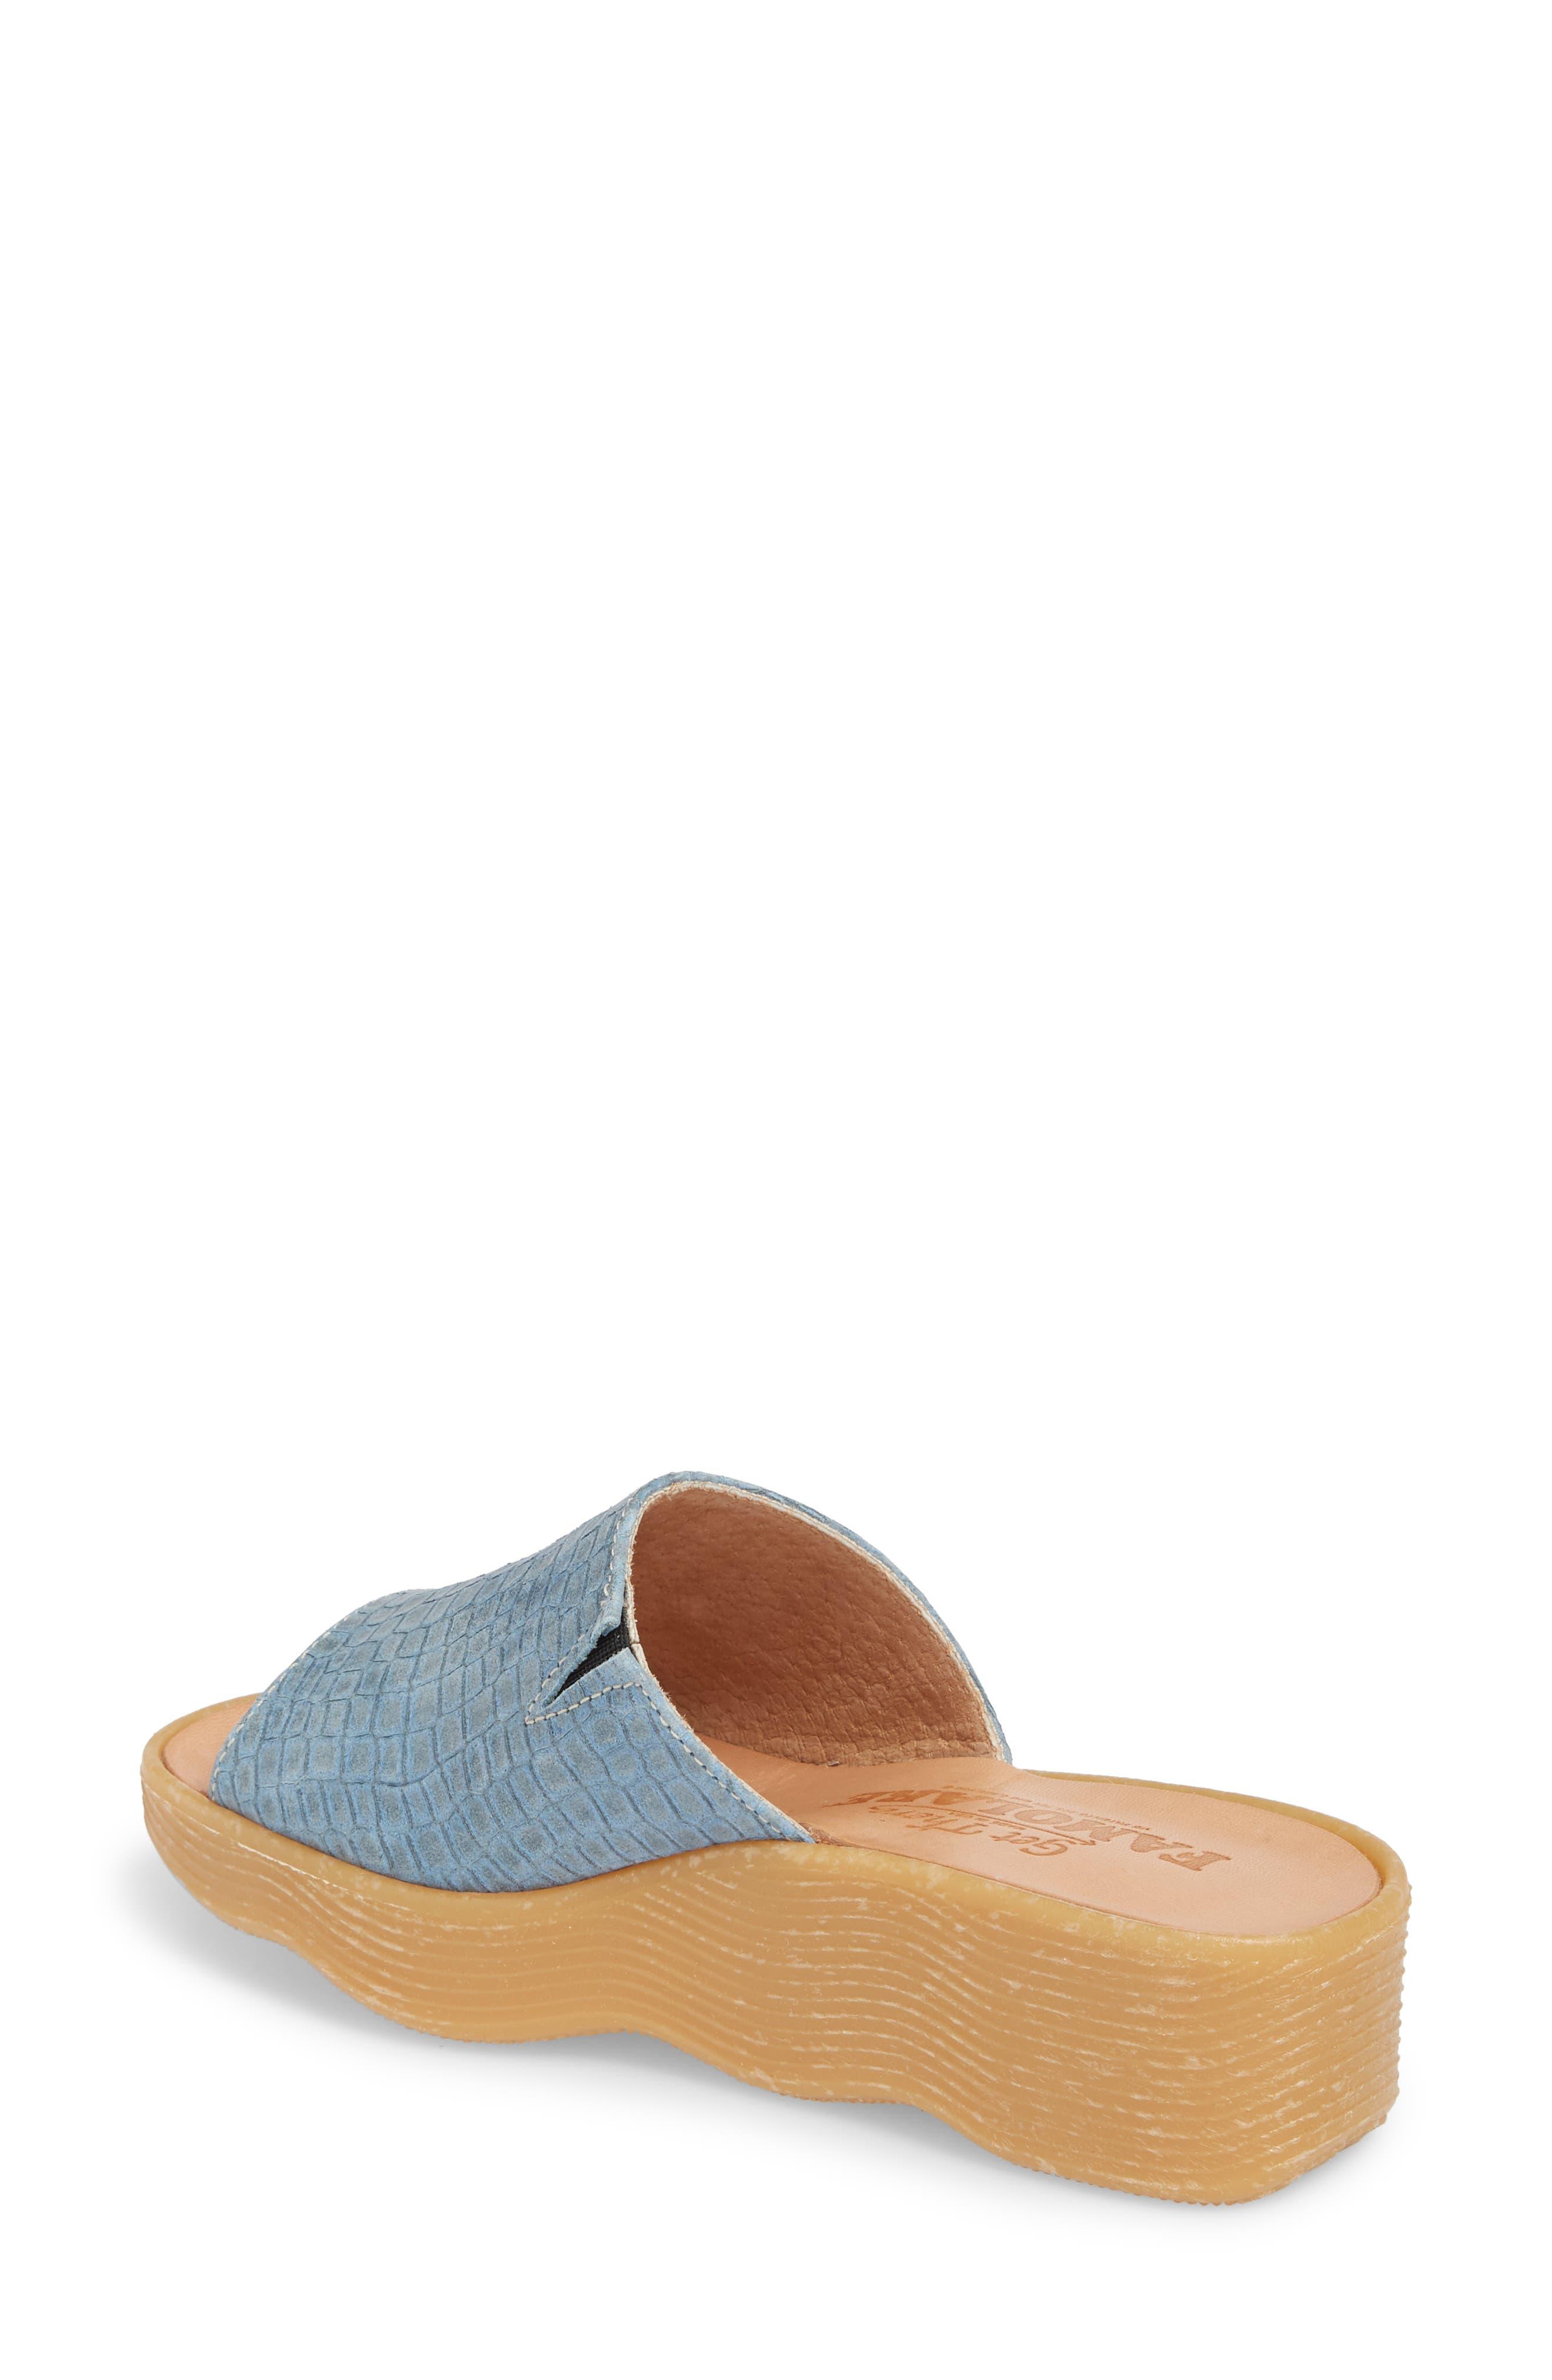 Slide N Sleek Wedge Slide Sandal,                             Alternate thumbnail 2, color,                             Aqua Croc Printed Leather